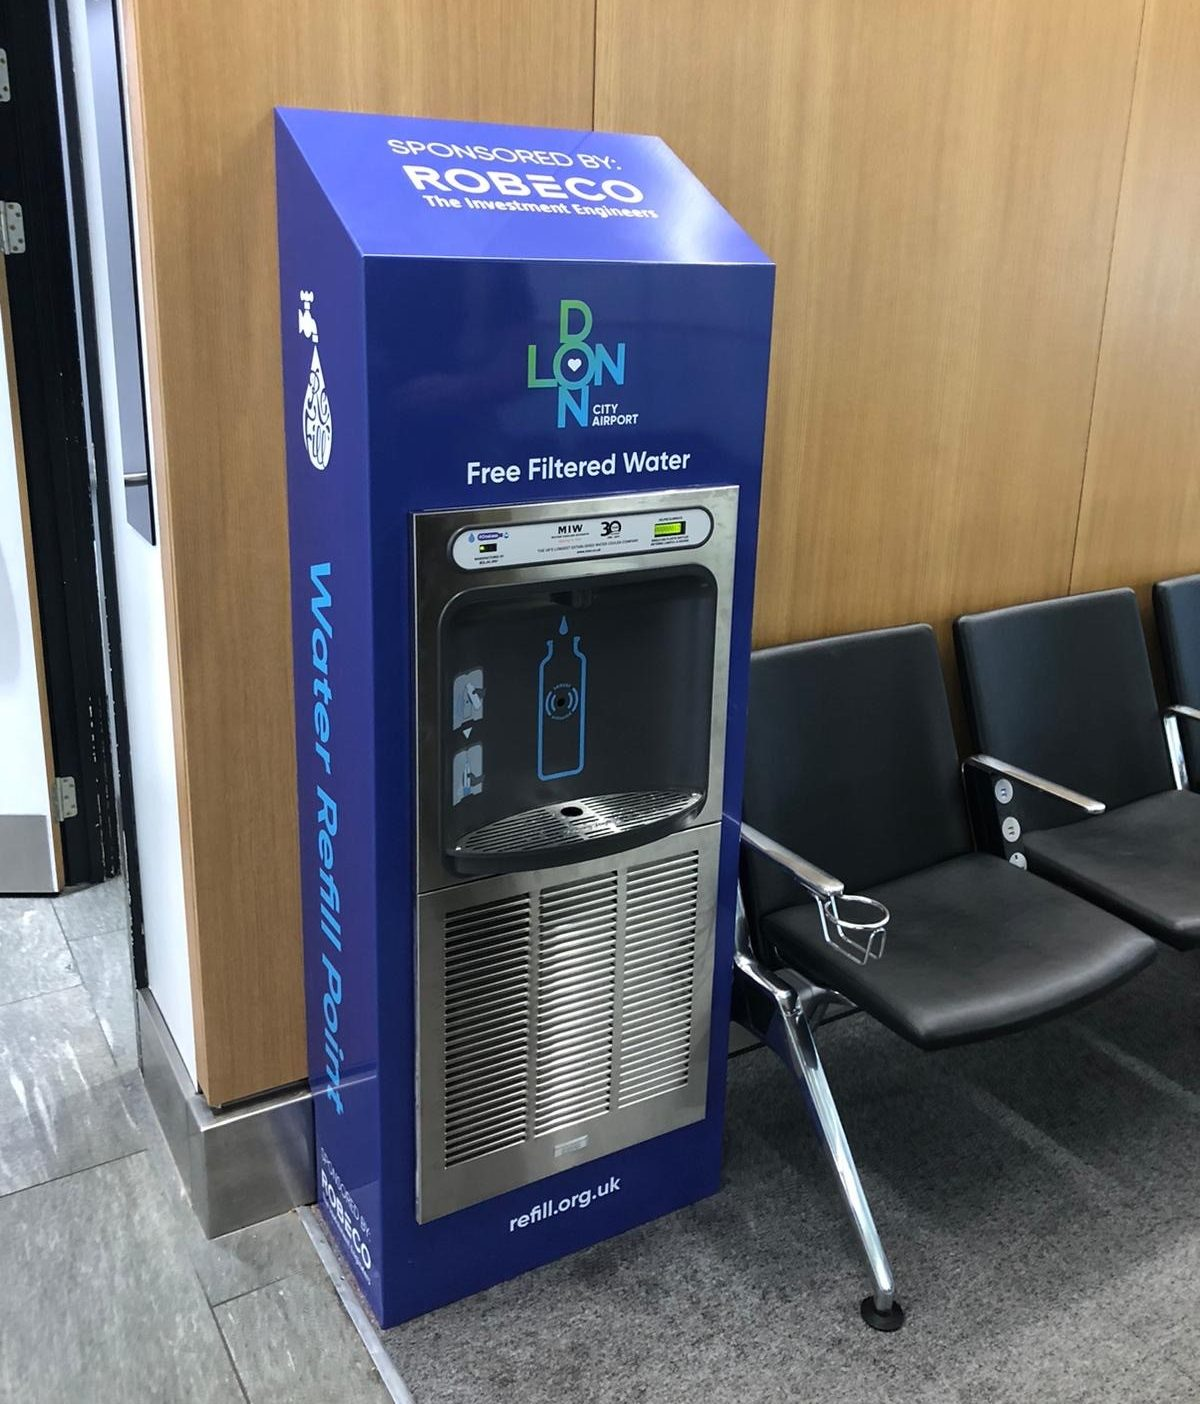 Eco Dispenser Bottle Refill Station Installed in London City Airport